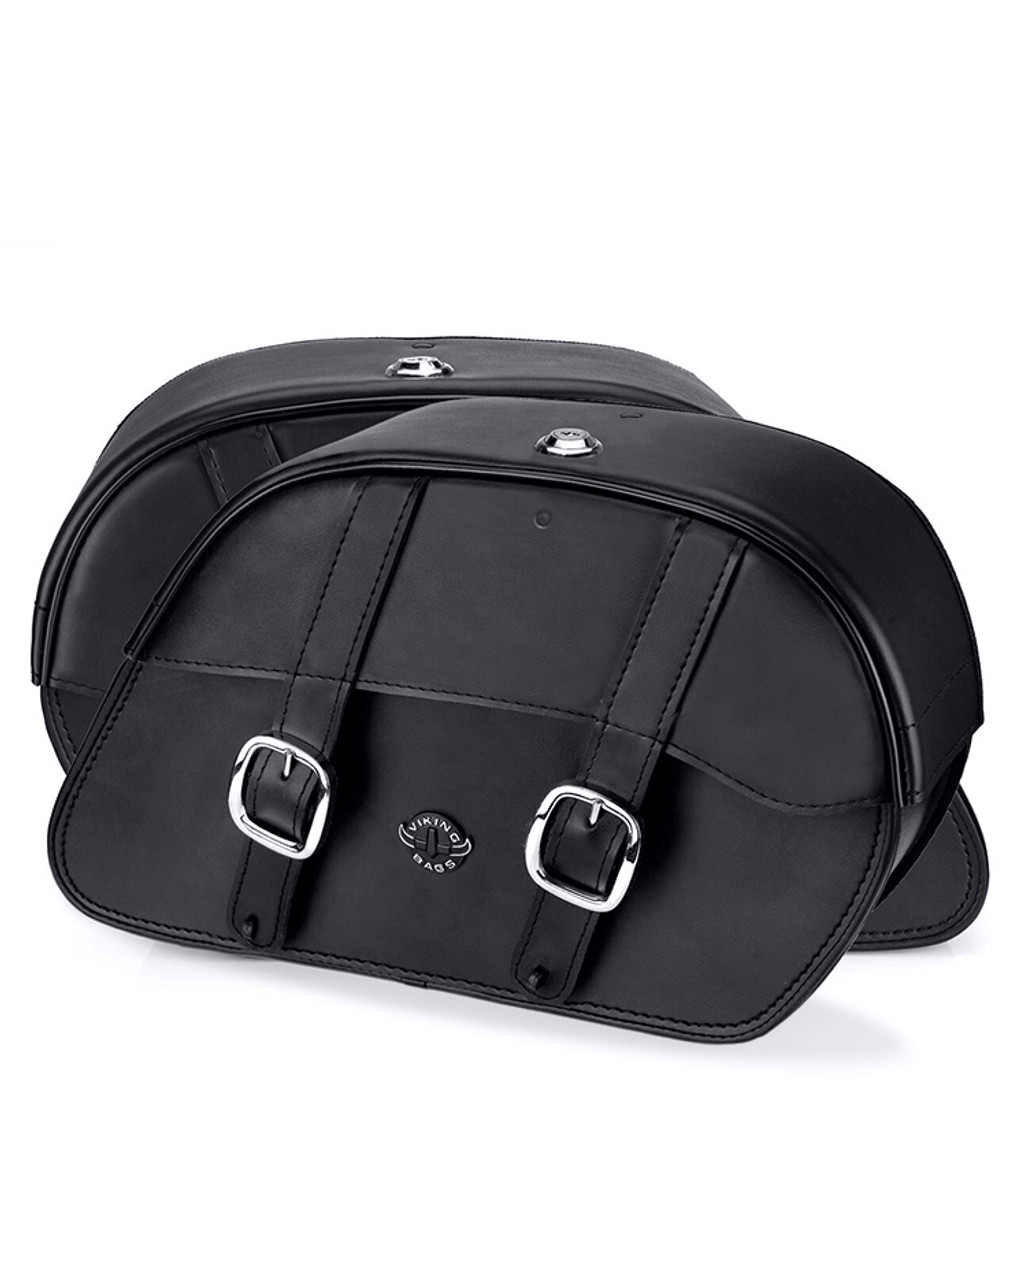 VikingBags Skarner Large Double Strap Honda 1100 Shadow Sabre Leather Motorcycle Saddlebags both bags view